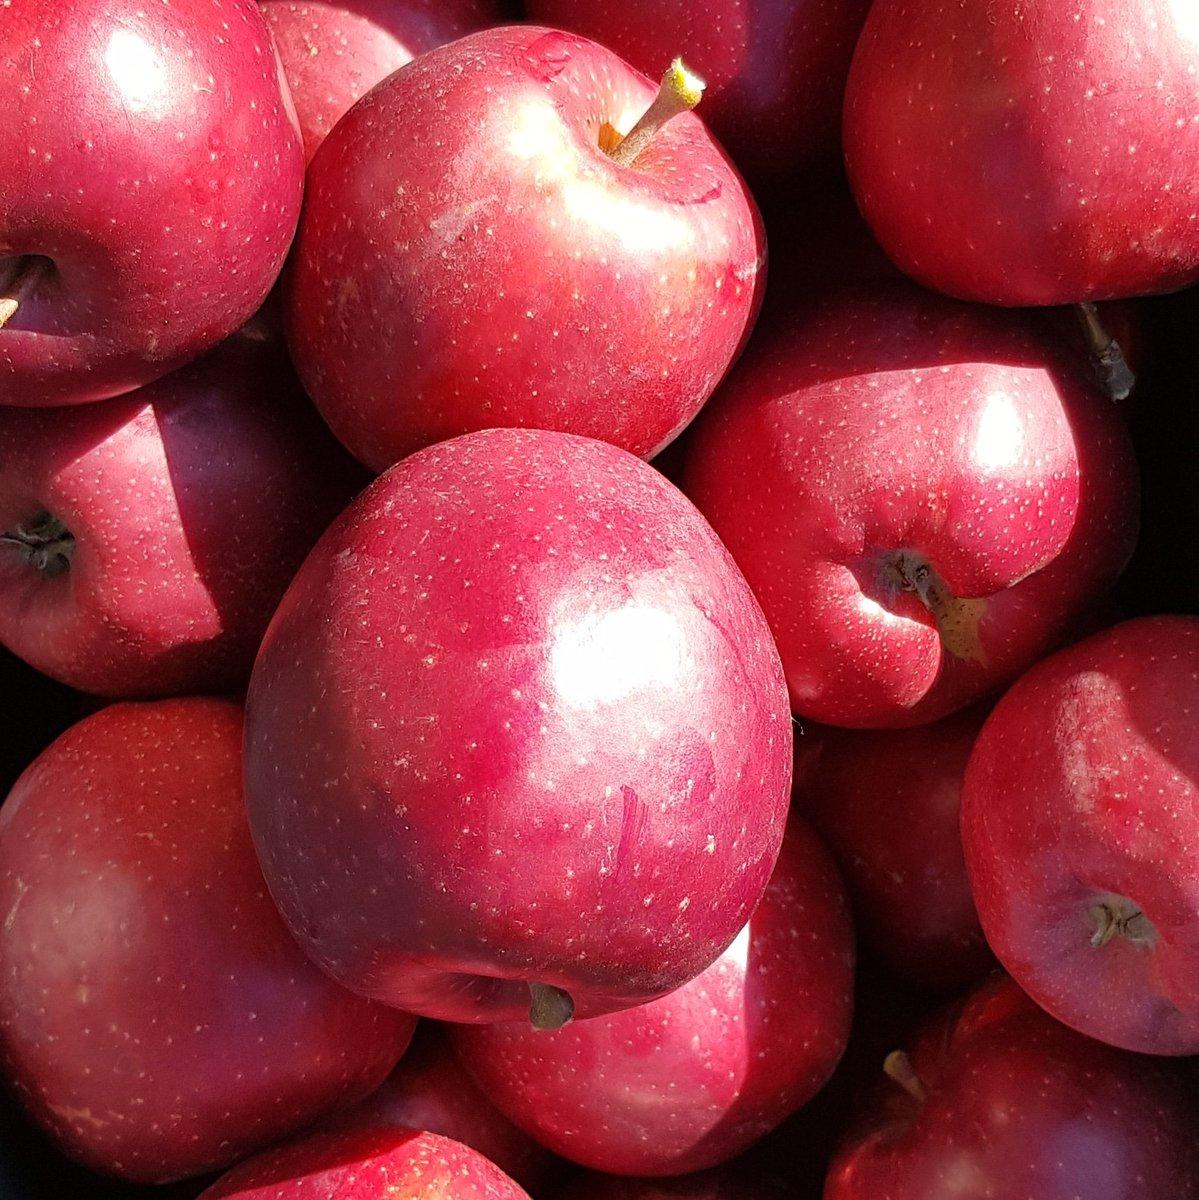 Mooie oogst uit eigen tuin 👍 #appeltaart #appelcompôte #appelflappen https://t.co/InJ1vvuLE2